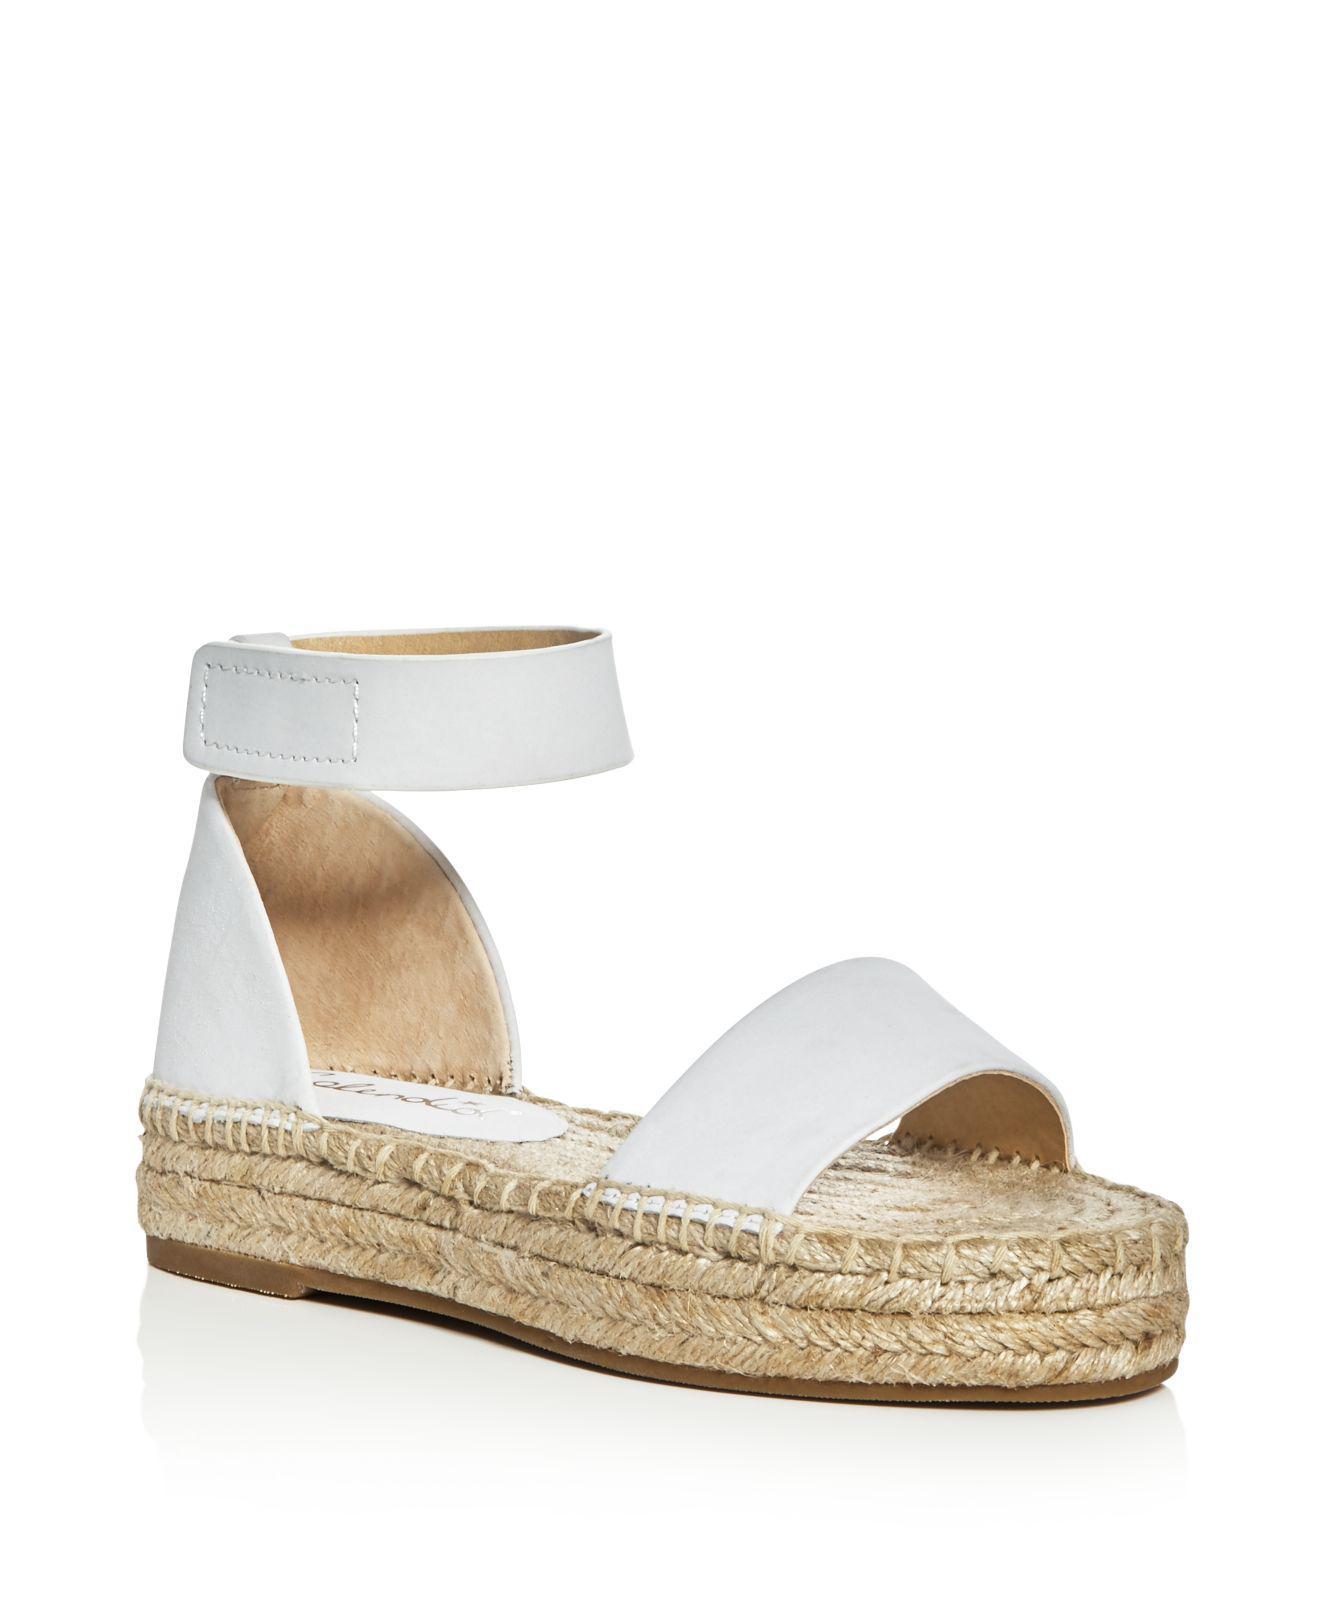 2271502d8da Lyst - Splendid Jensen Ankle Strap Espadrille Sandals in White